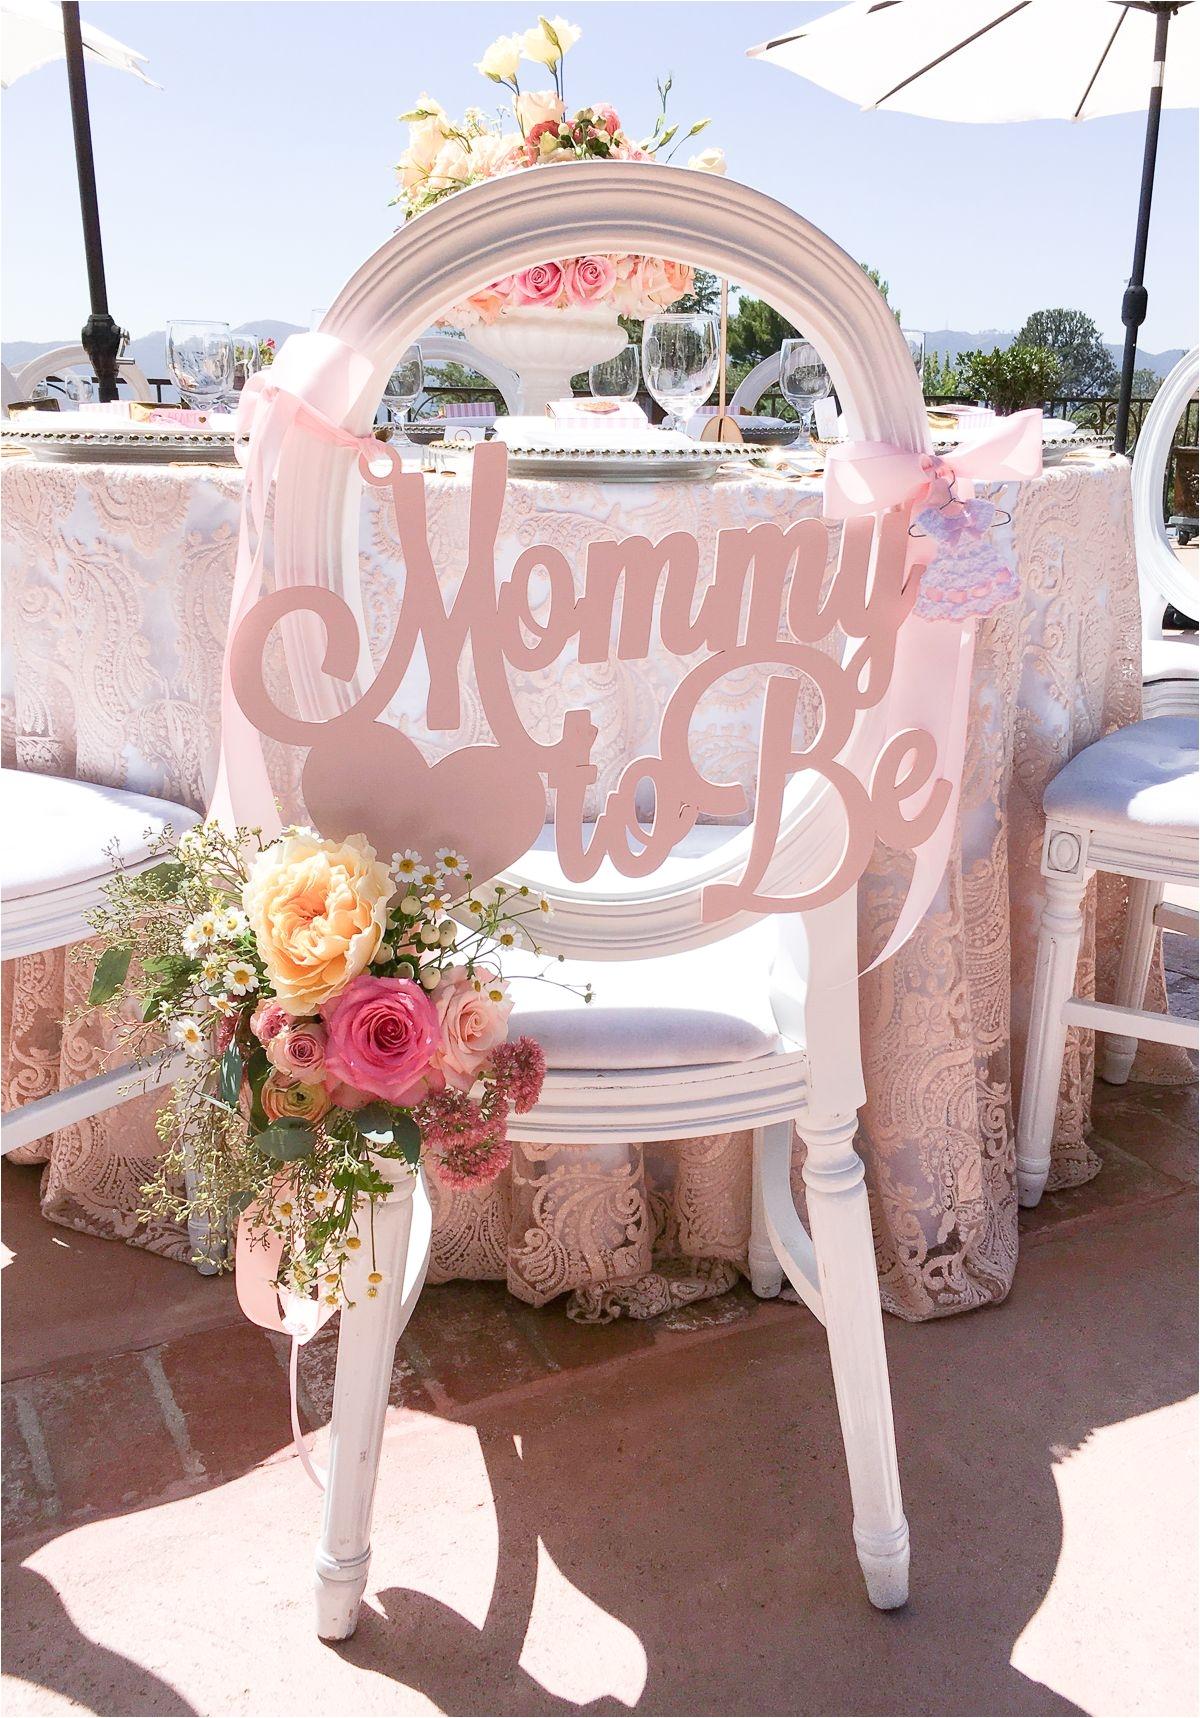 Royal Baby Shower Chairs for Sale | BradsHomeFurnishings